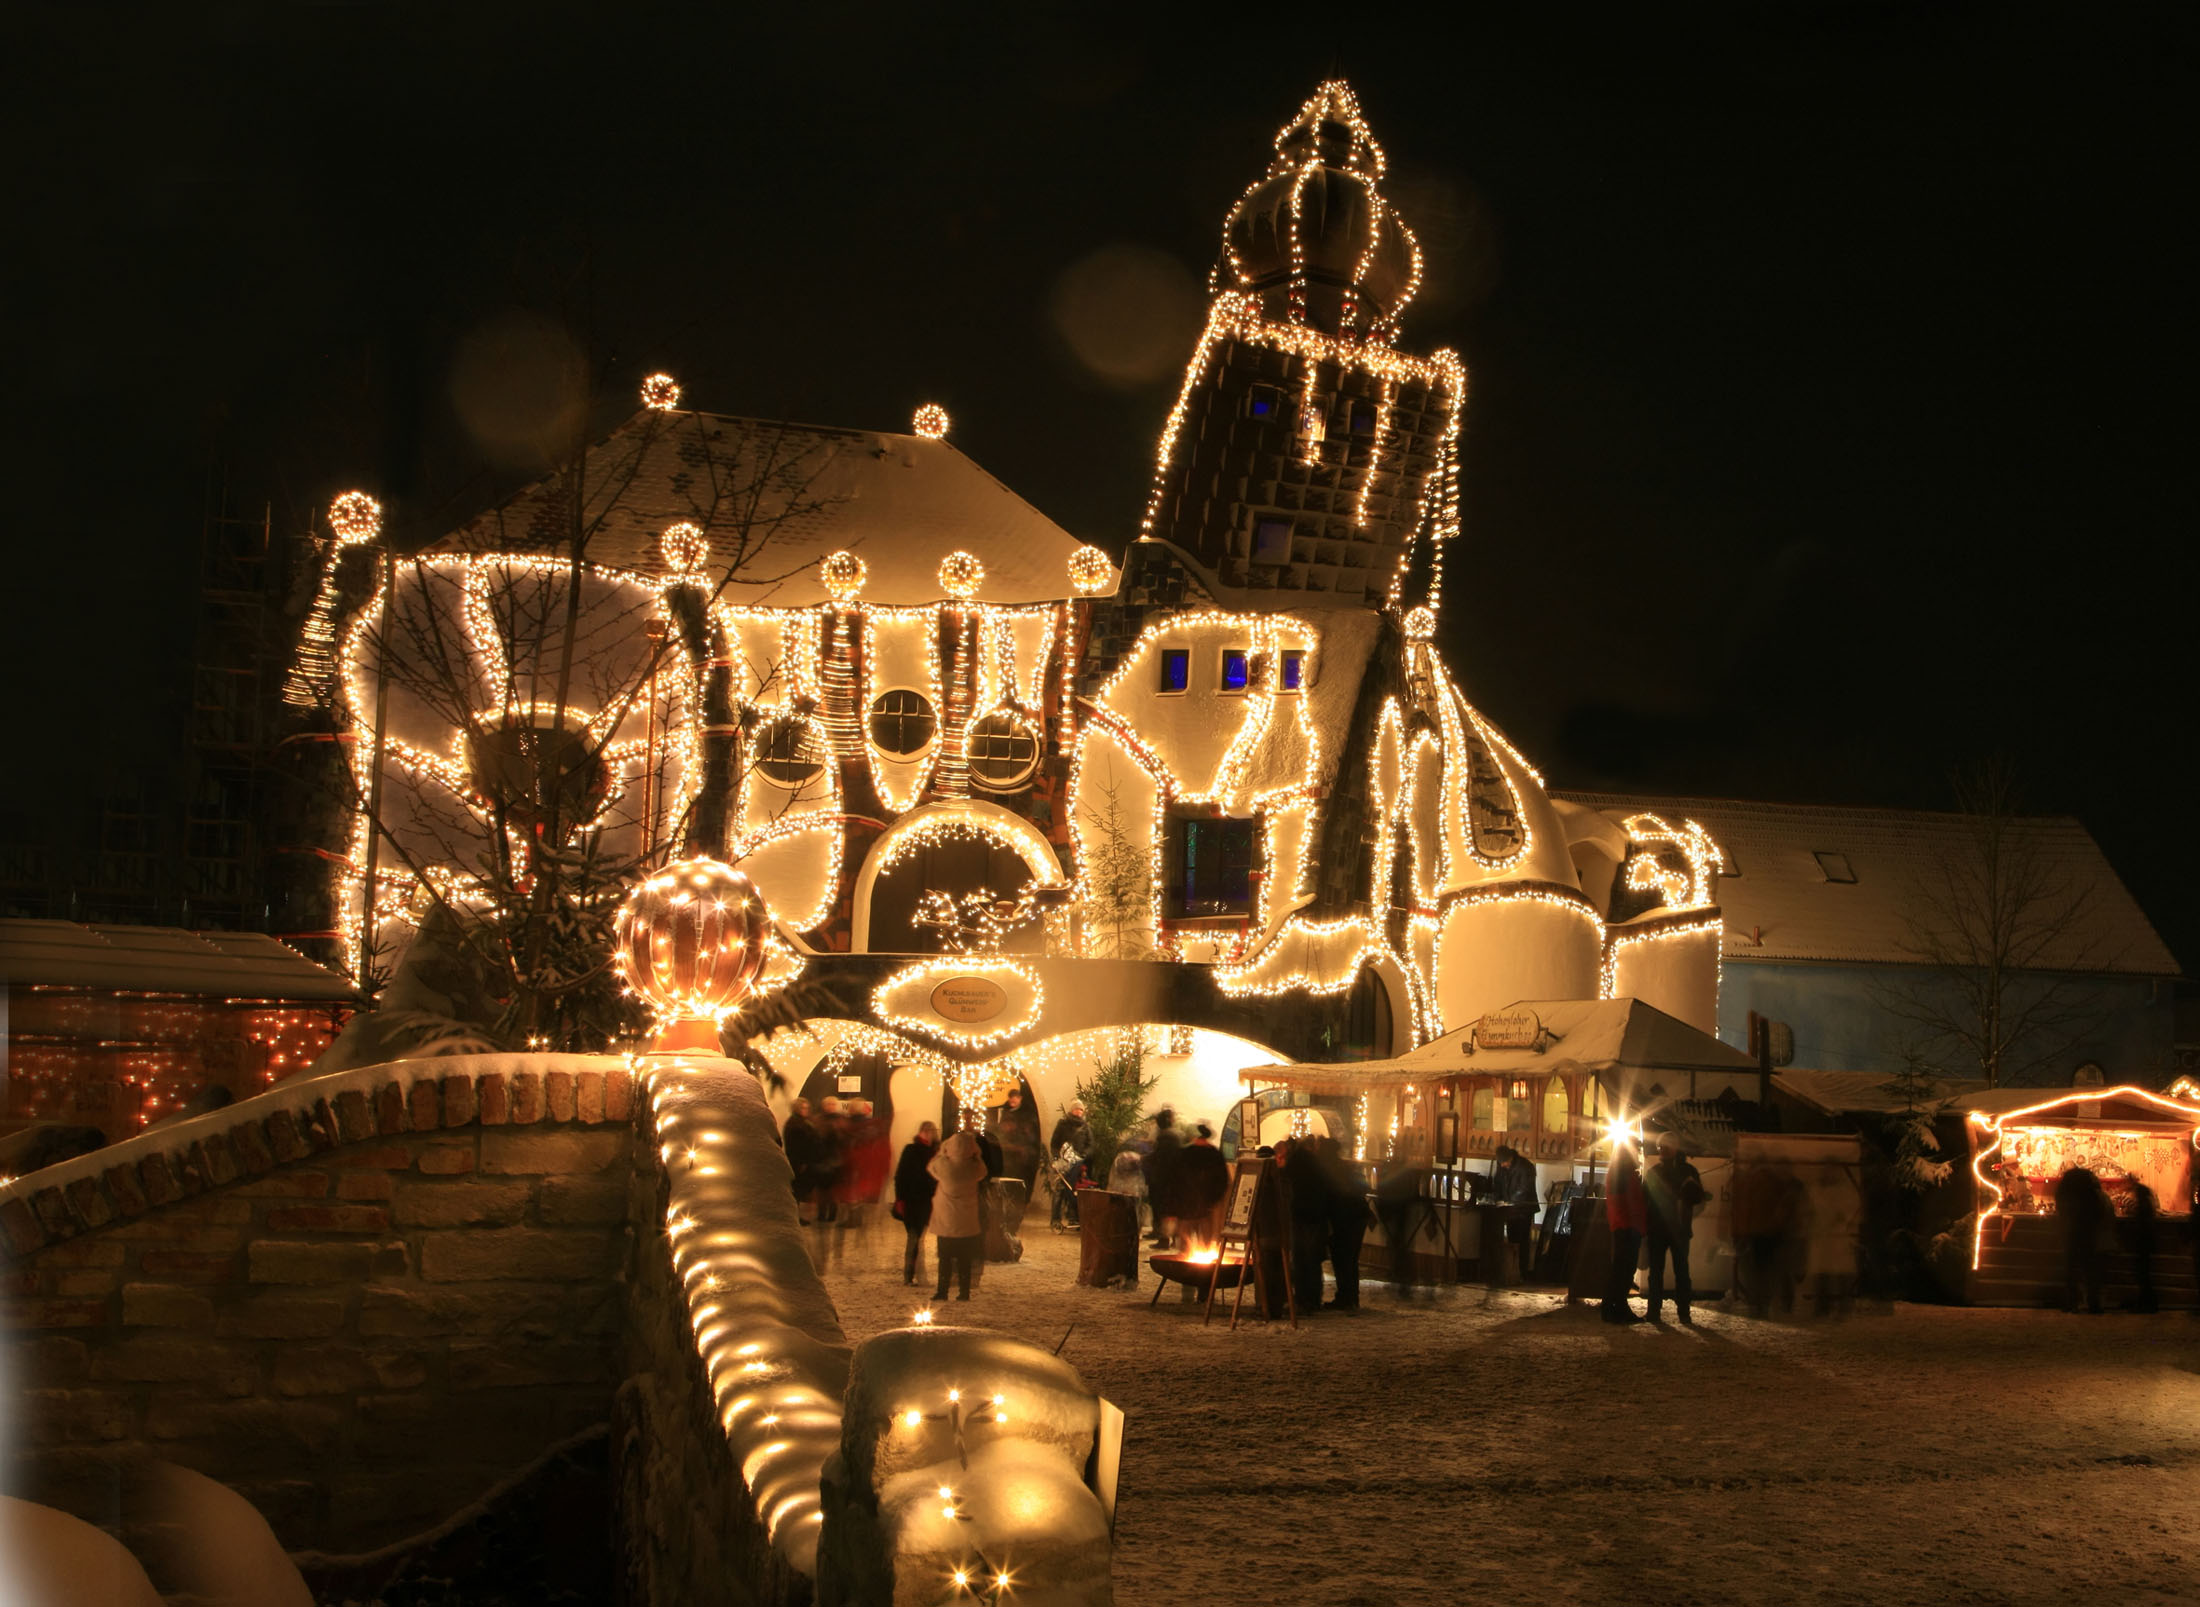 Christmas market in the brewery Kuchlbauer - Kuchlbauer's Turmweihnacht